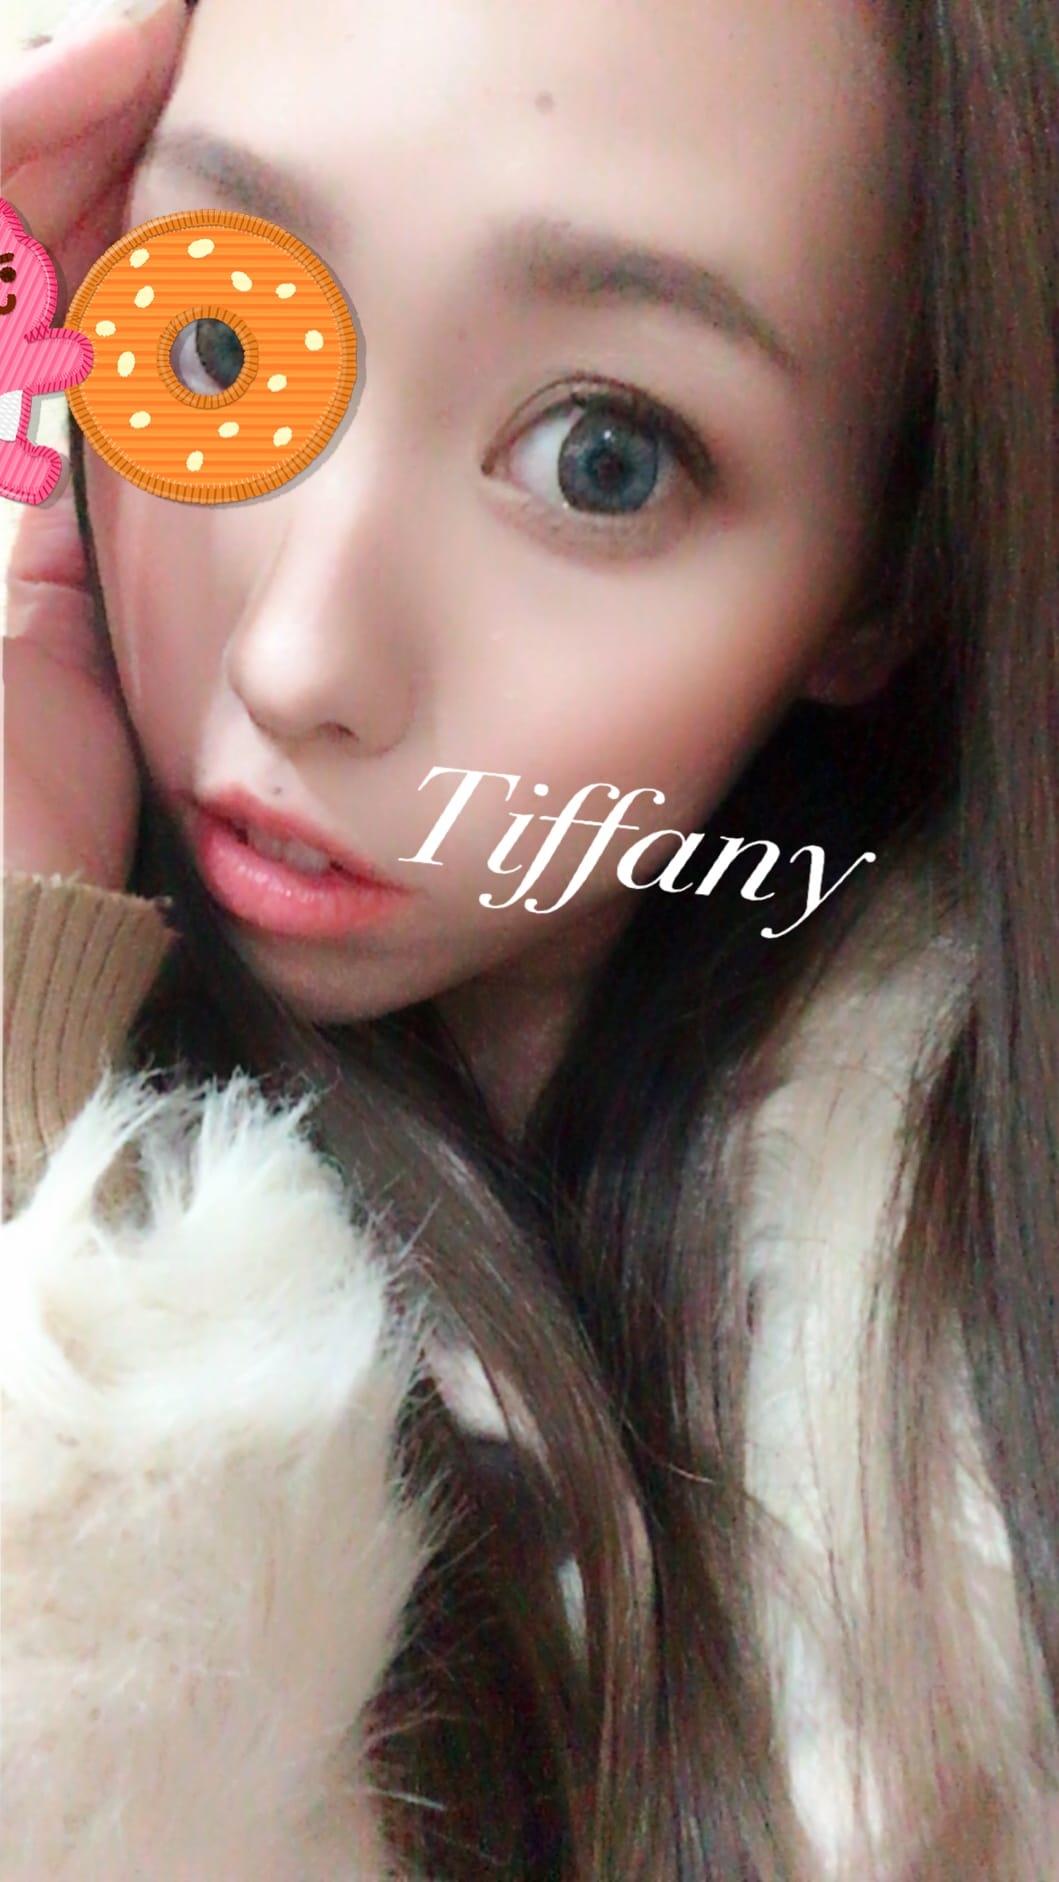 「【hello!】」10/19(10/19) 09:30 | ティファニーの写メ・風俗動画